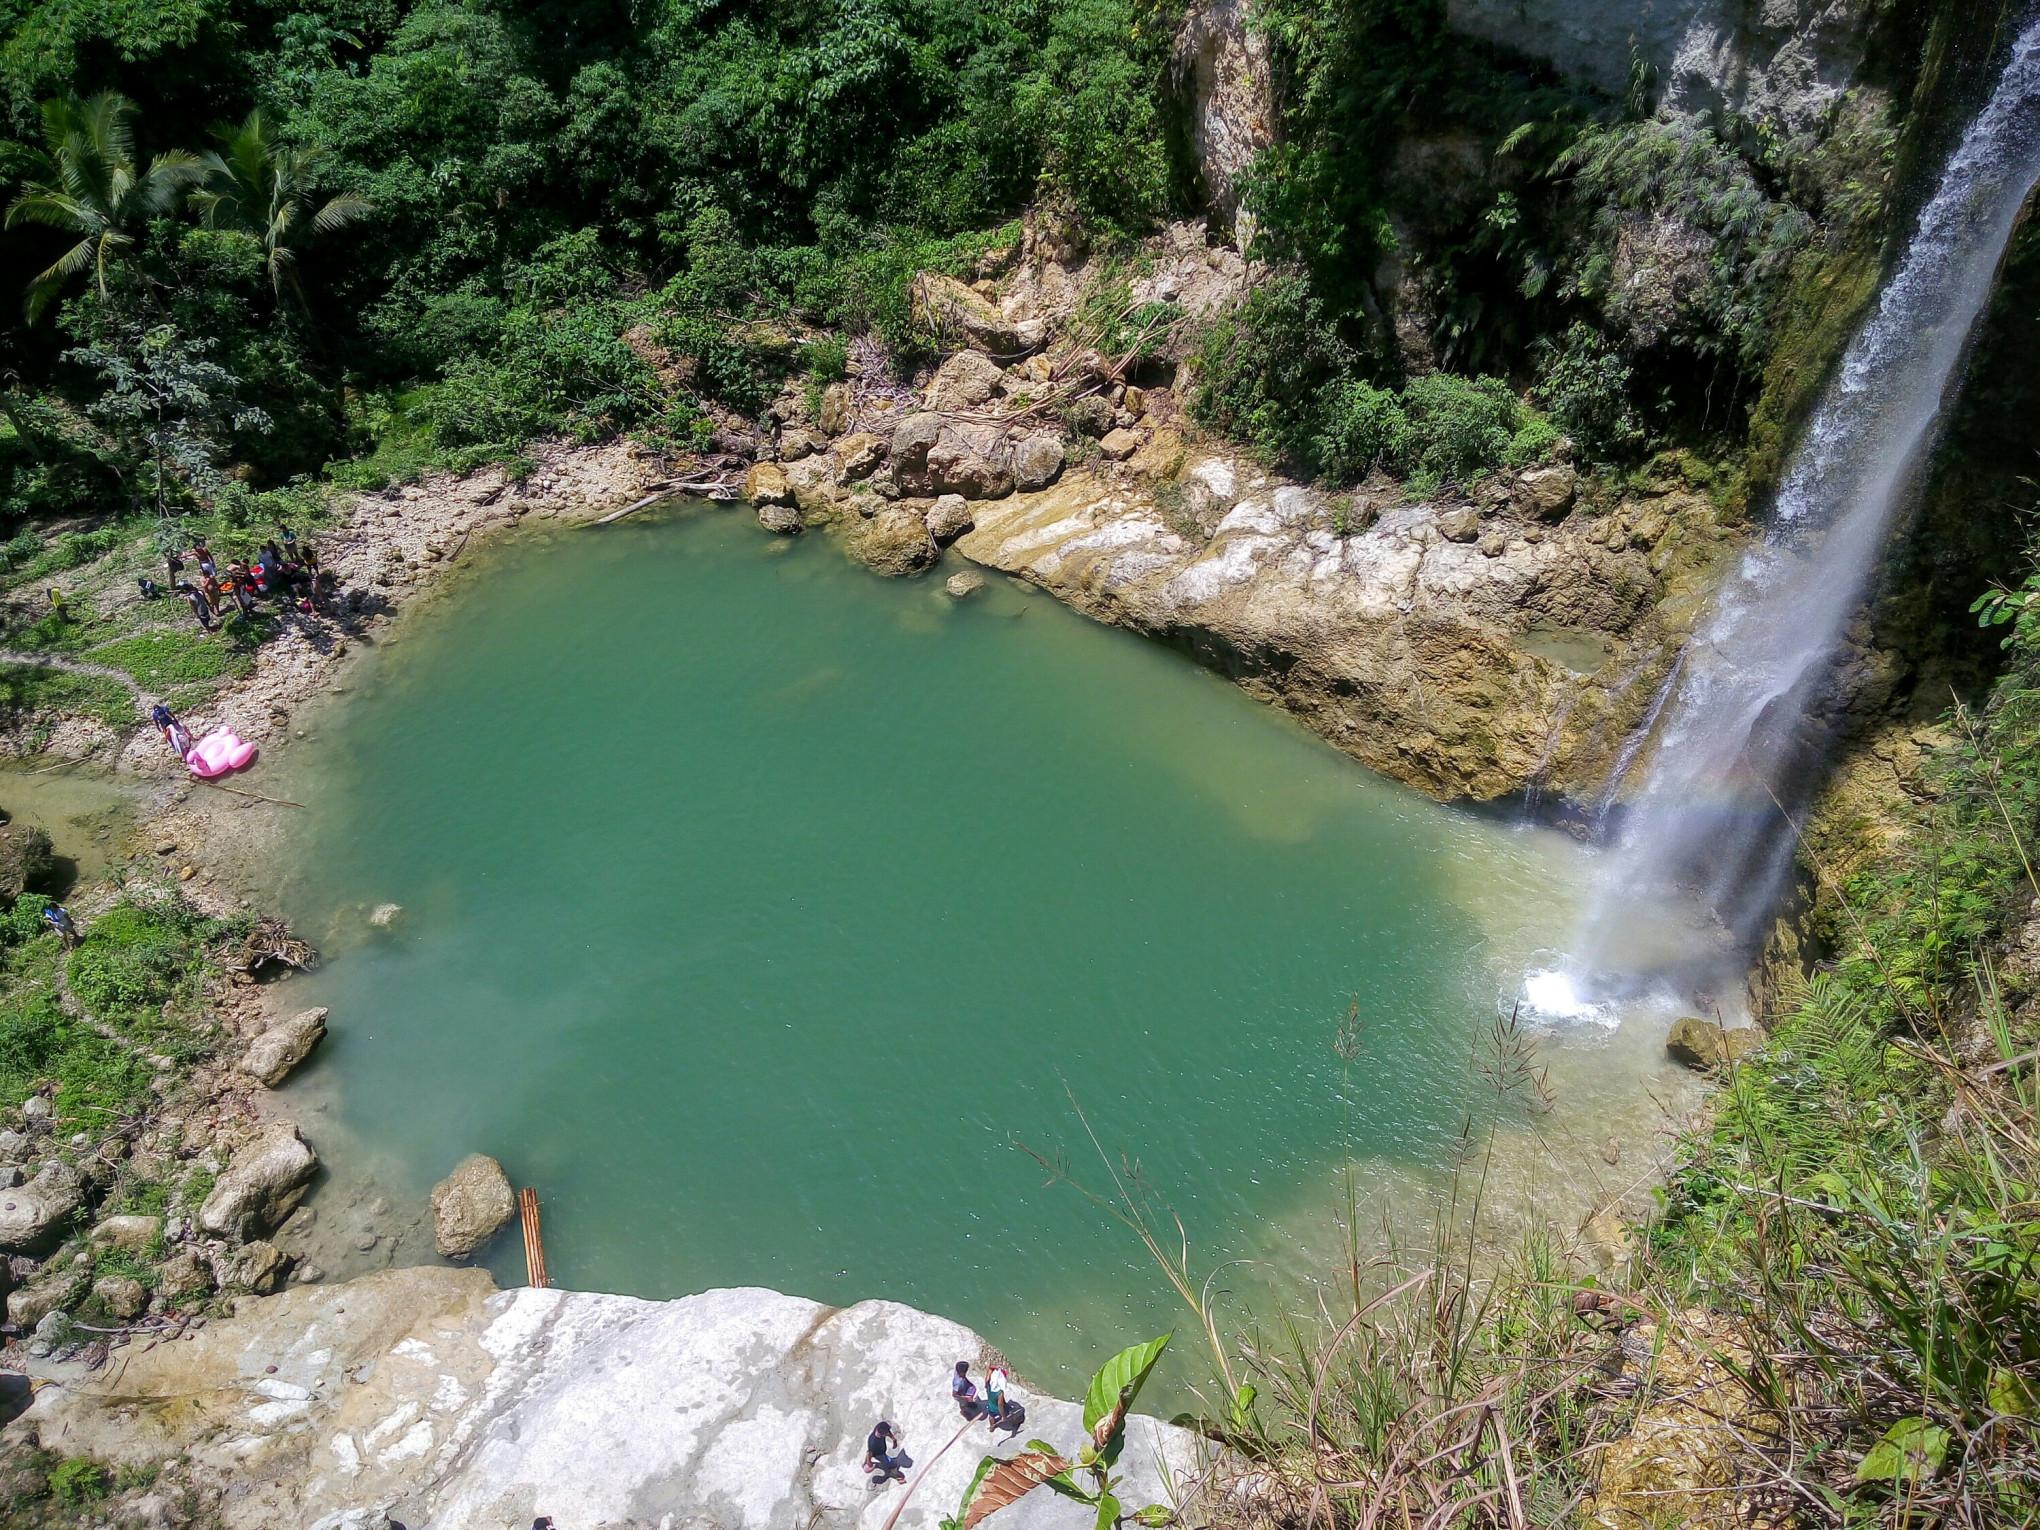 bohol philippines blog, bohol falls, camugao falls bohol, camugao falls blog, falls balilihan bohol, bohol blogger